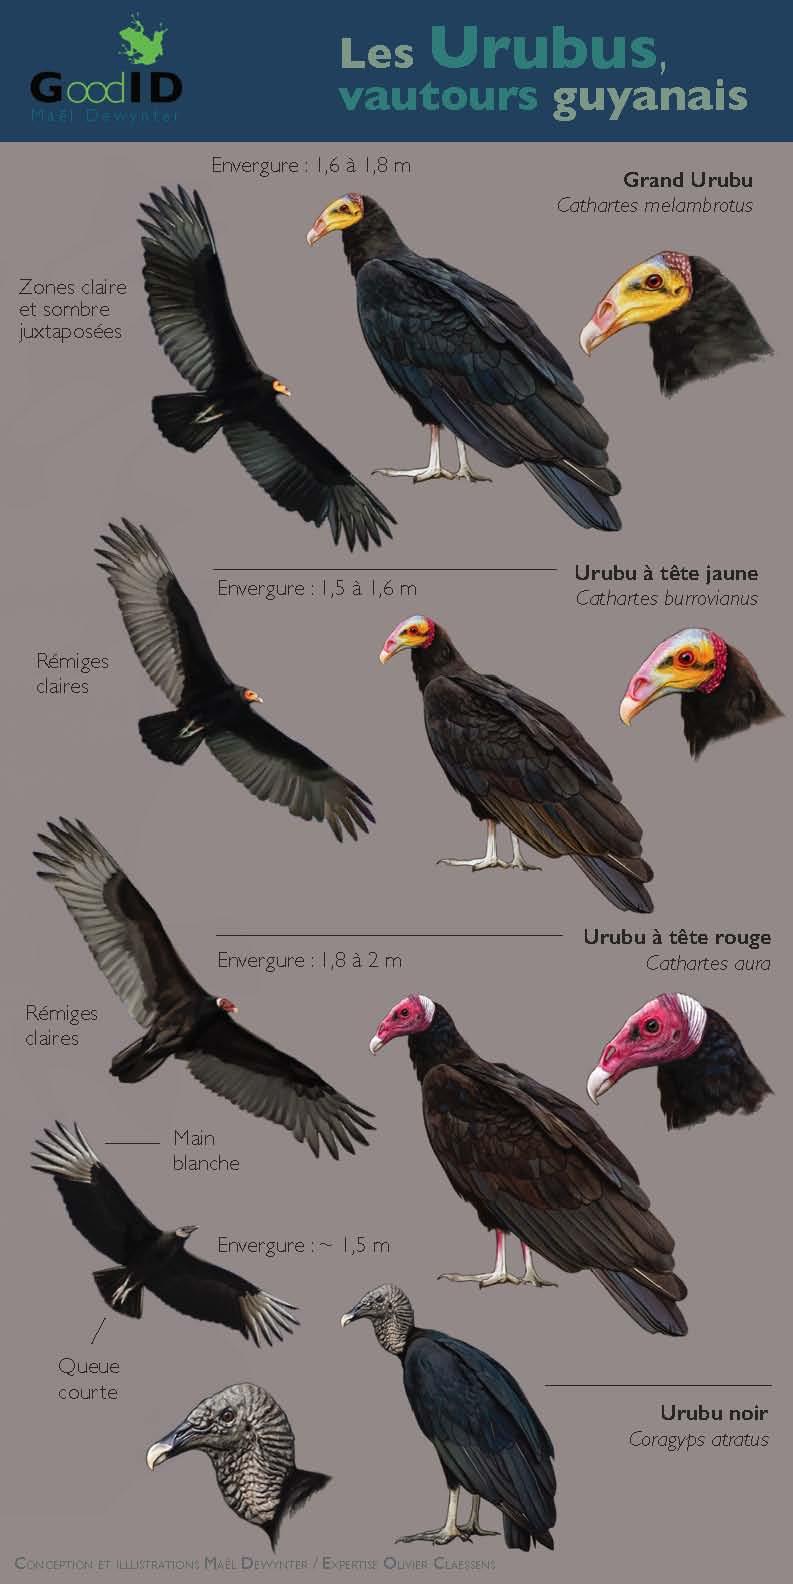 https://cdnfiles2.biolovision.net/www.faune-guyane.fr/userfiles/Documentsdivers/Oiseaux/MemoUrubusM.Dewynter110520.jpg